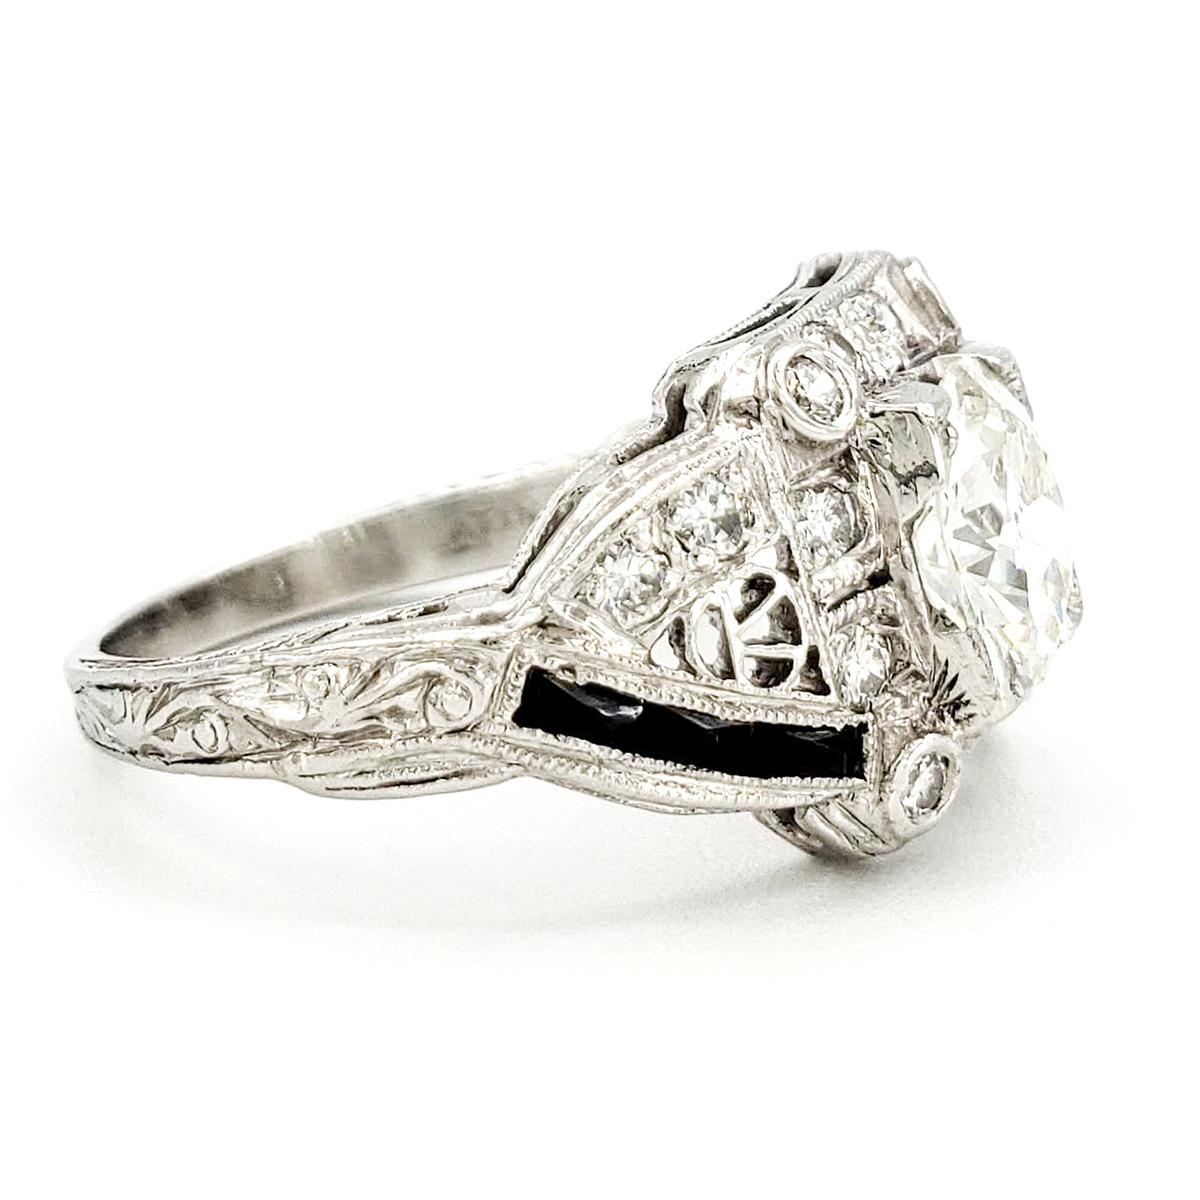 vintage-platinum-engagement-ring-with-0-85-carat-old-european-cut-diamond-egl-h-vs2